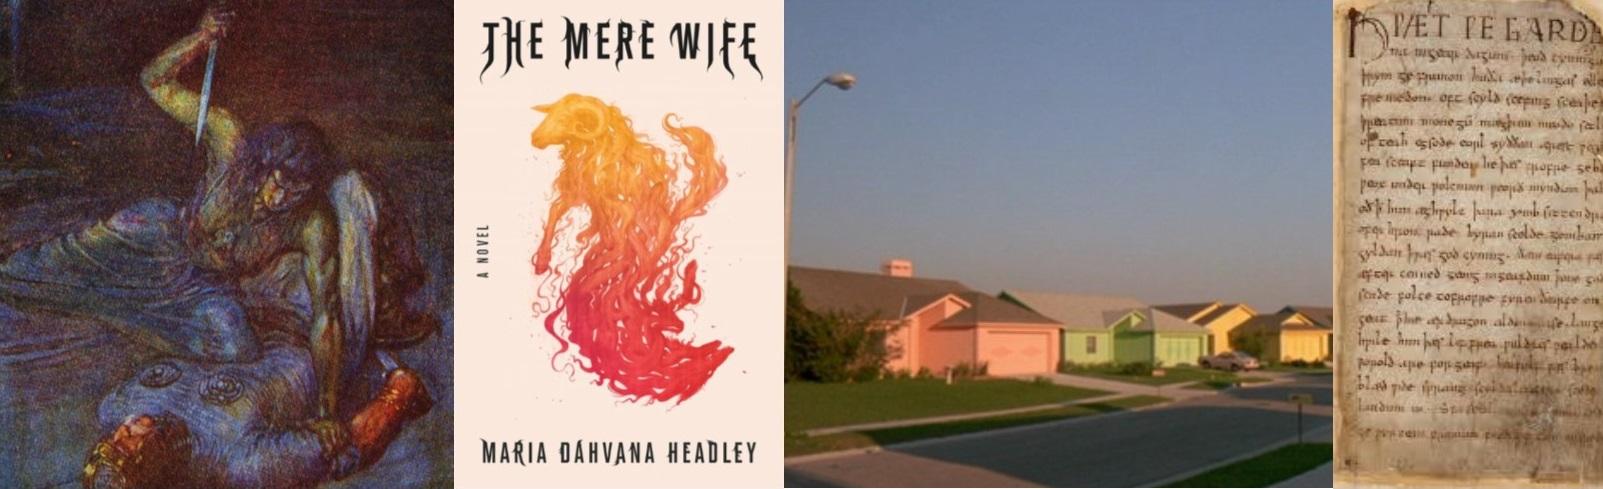 mere wife banner.jpg